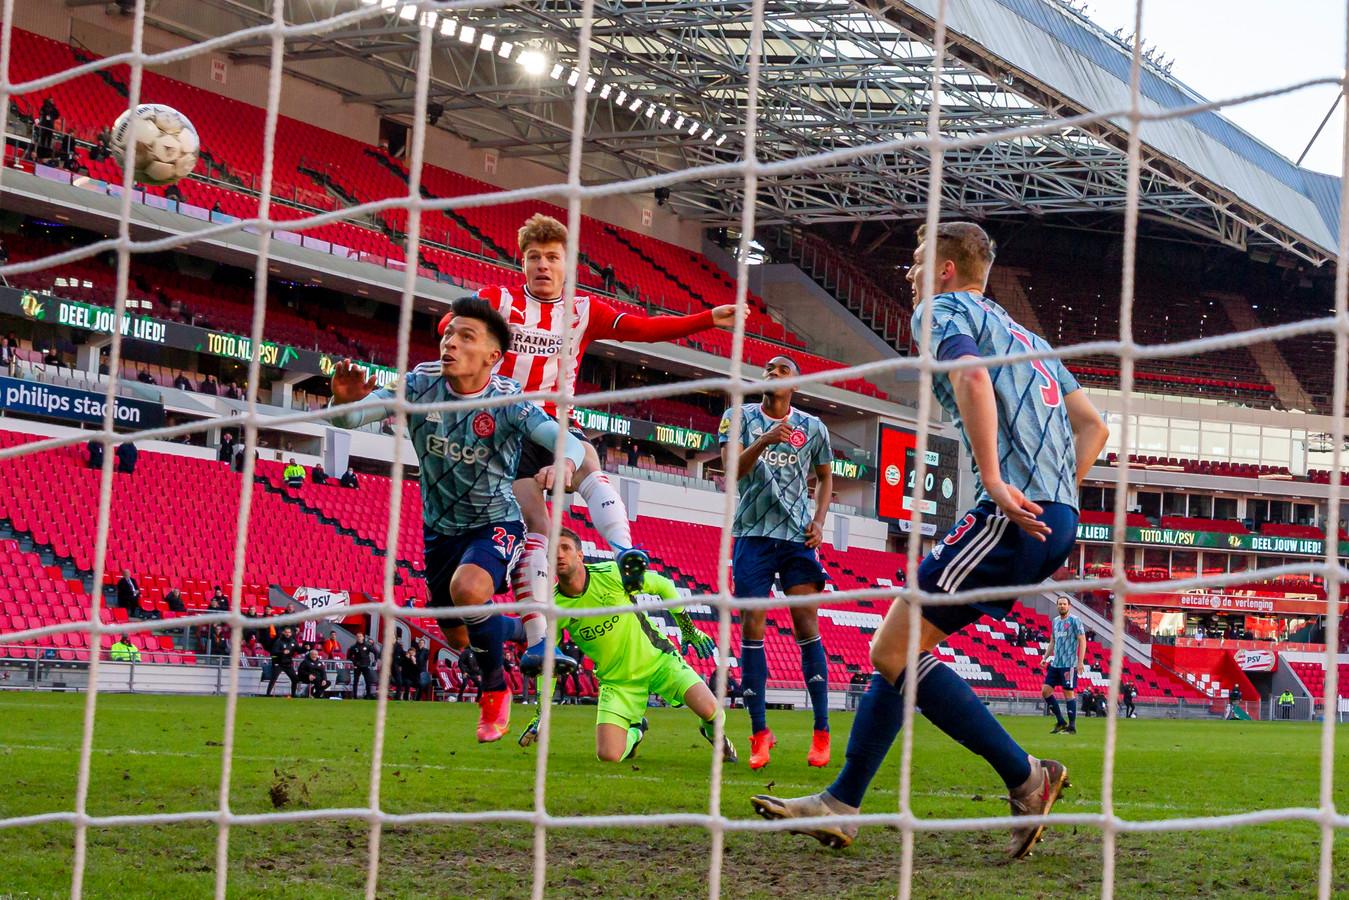 Yorbe Vertessen maakt de 2-0, maar die goal wordt daarna afgekeurd.